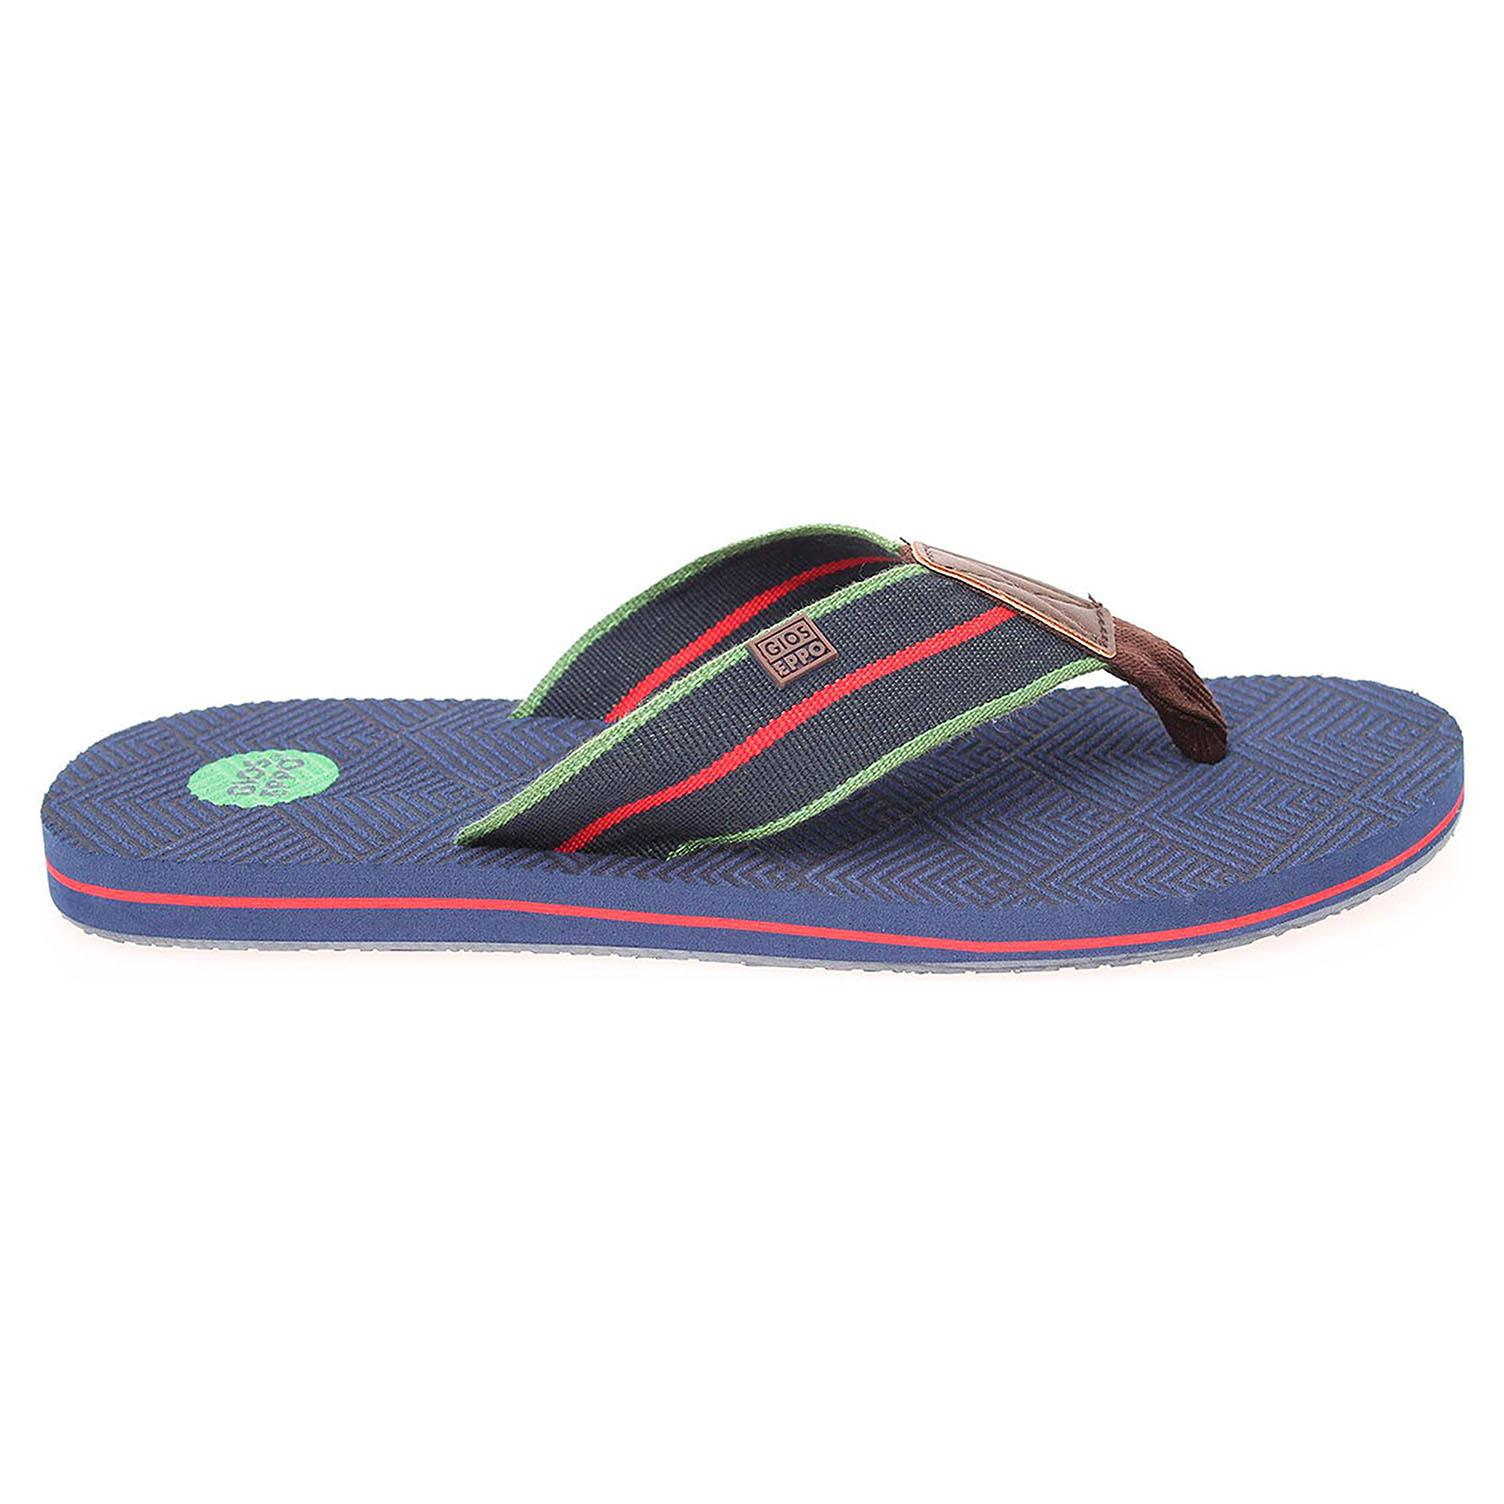 Gioseppo Caribean navy pánské plážové pantofle 41